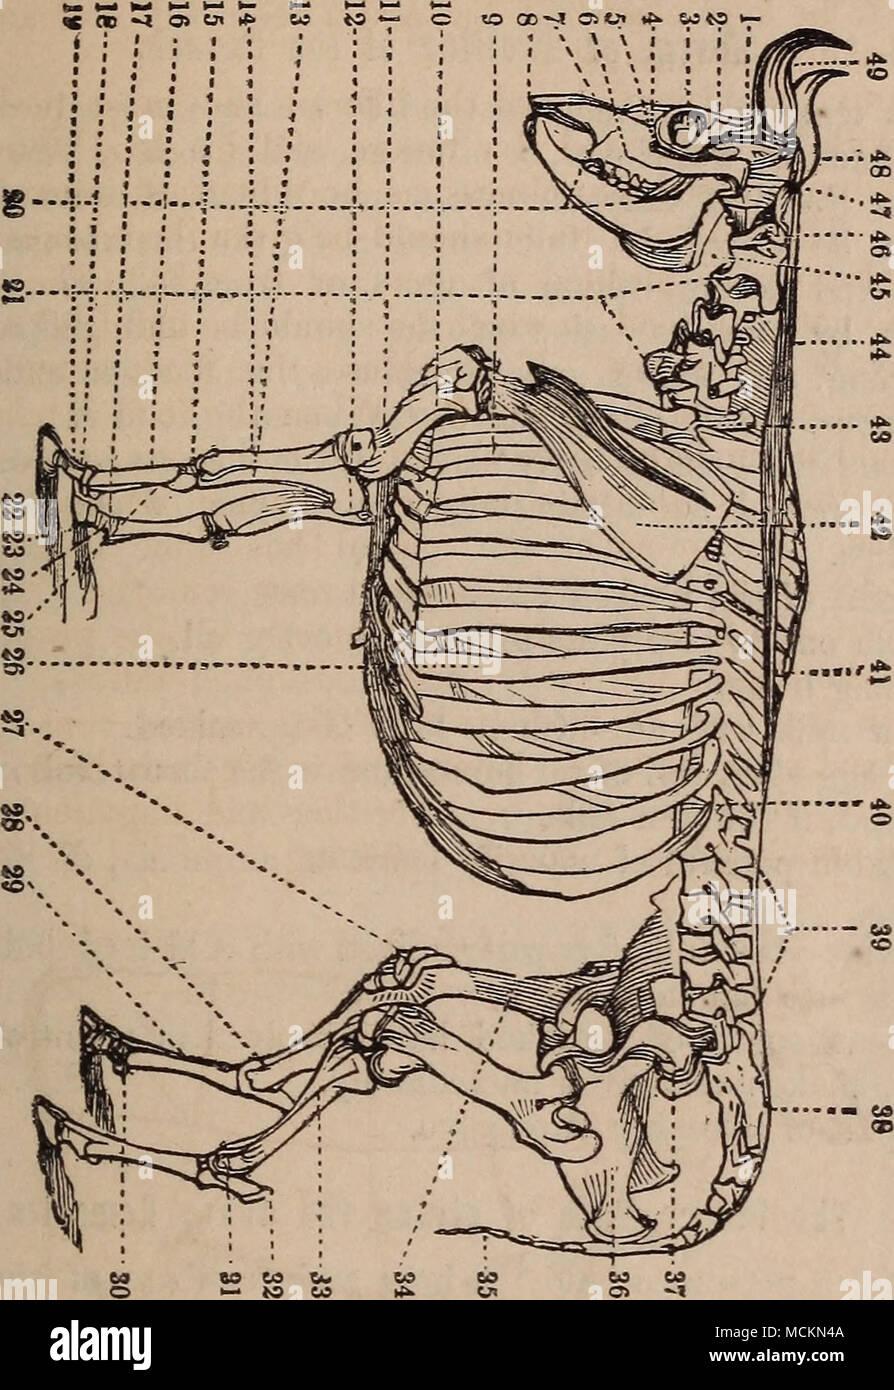 Temporal Bone Stockfotos & Temporal Bone Bilder - Seite 2 - Alamy